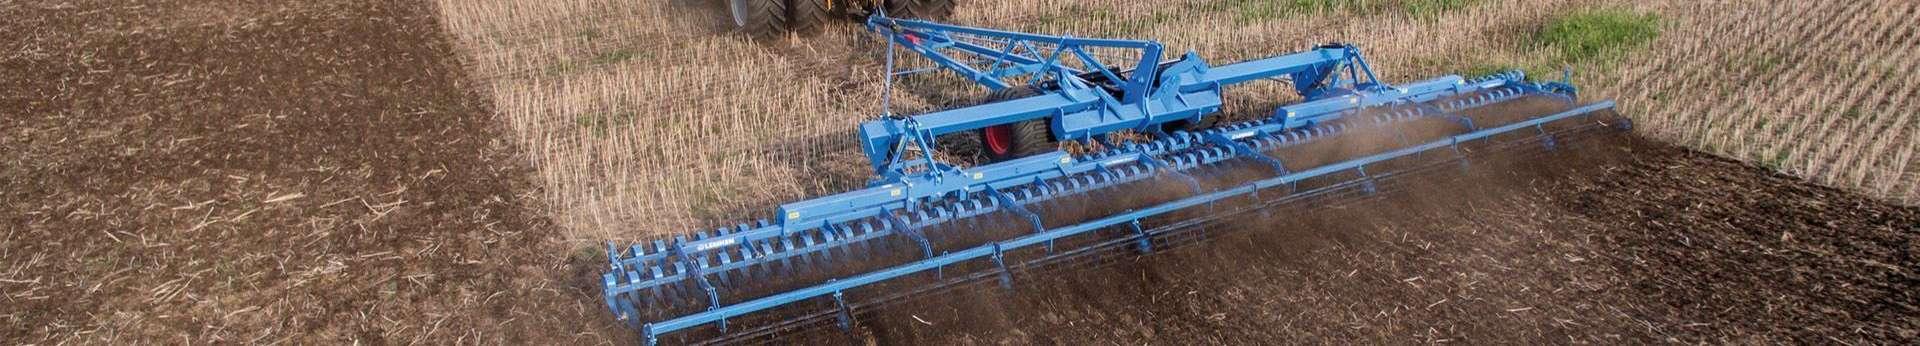 Agregat uprawowy lemken gigant cultivator podczas uprawy pola ścierniska Korbanek.pl